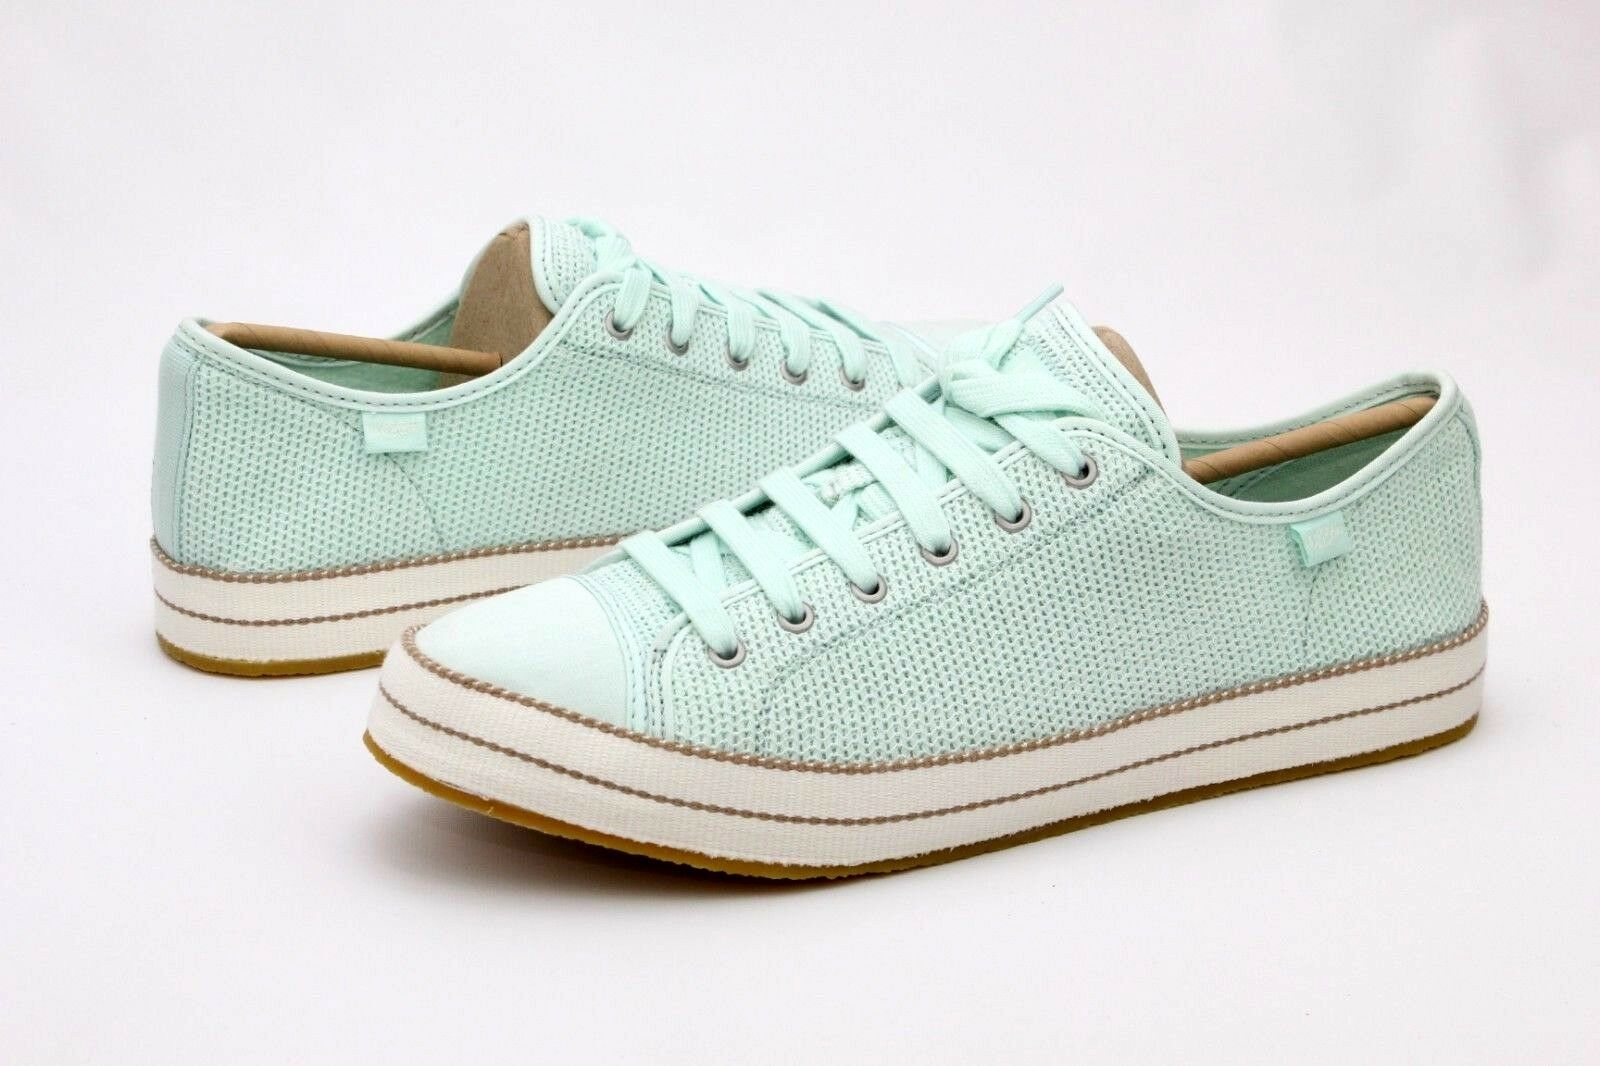 da1336abc37 UGG Claudi Aqua Color Fashion Sneaker Shoe Size 12 US